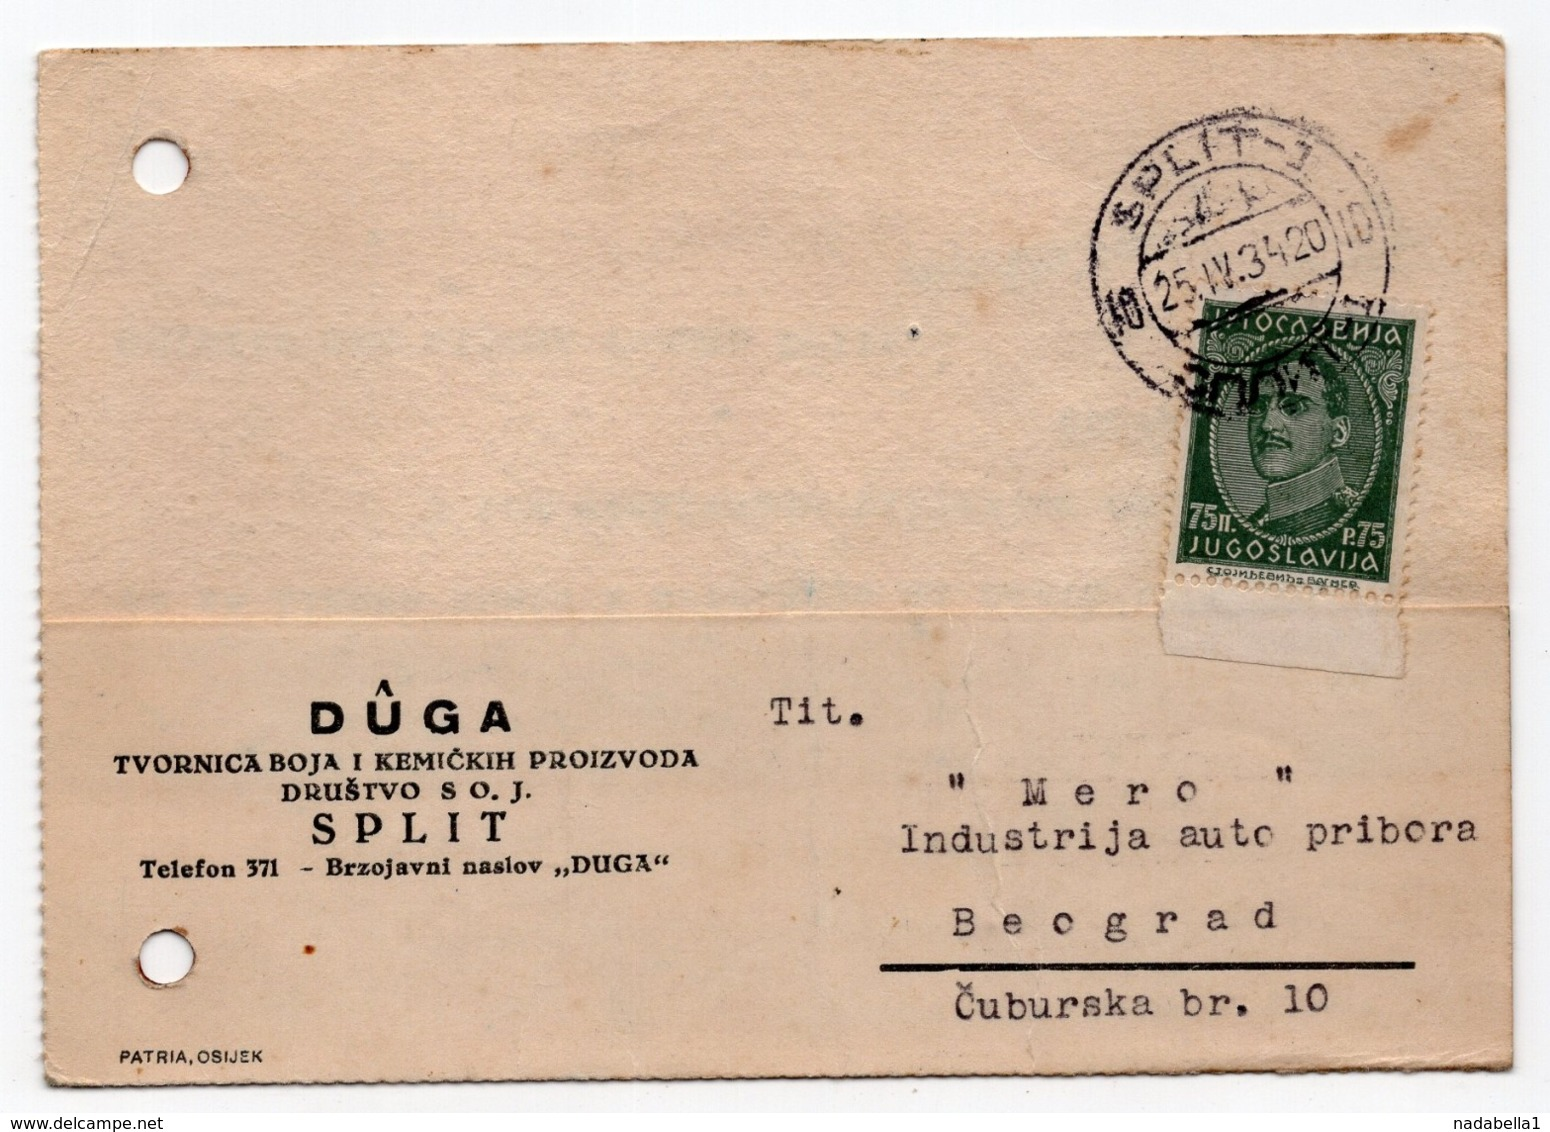 1934 YUGOSLAVIA, CROATIA, SPLIT TO BELGRADE, CORRESPONDENCE CARD, DUGA, CHEMICAL INDUSTRY - 1931-1941 Kingdom Of Yugoslavia